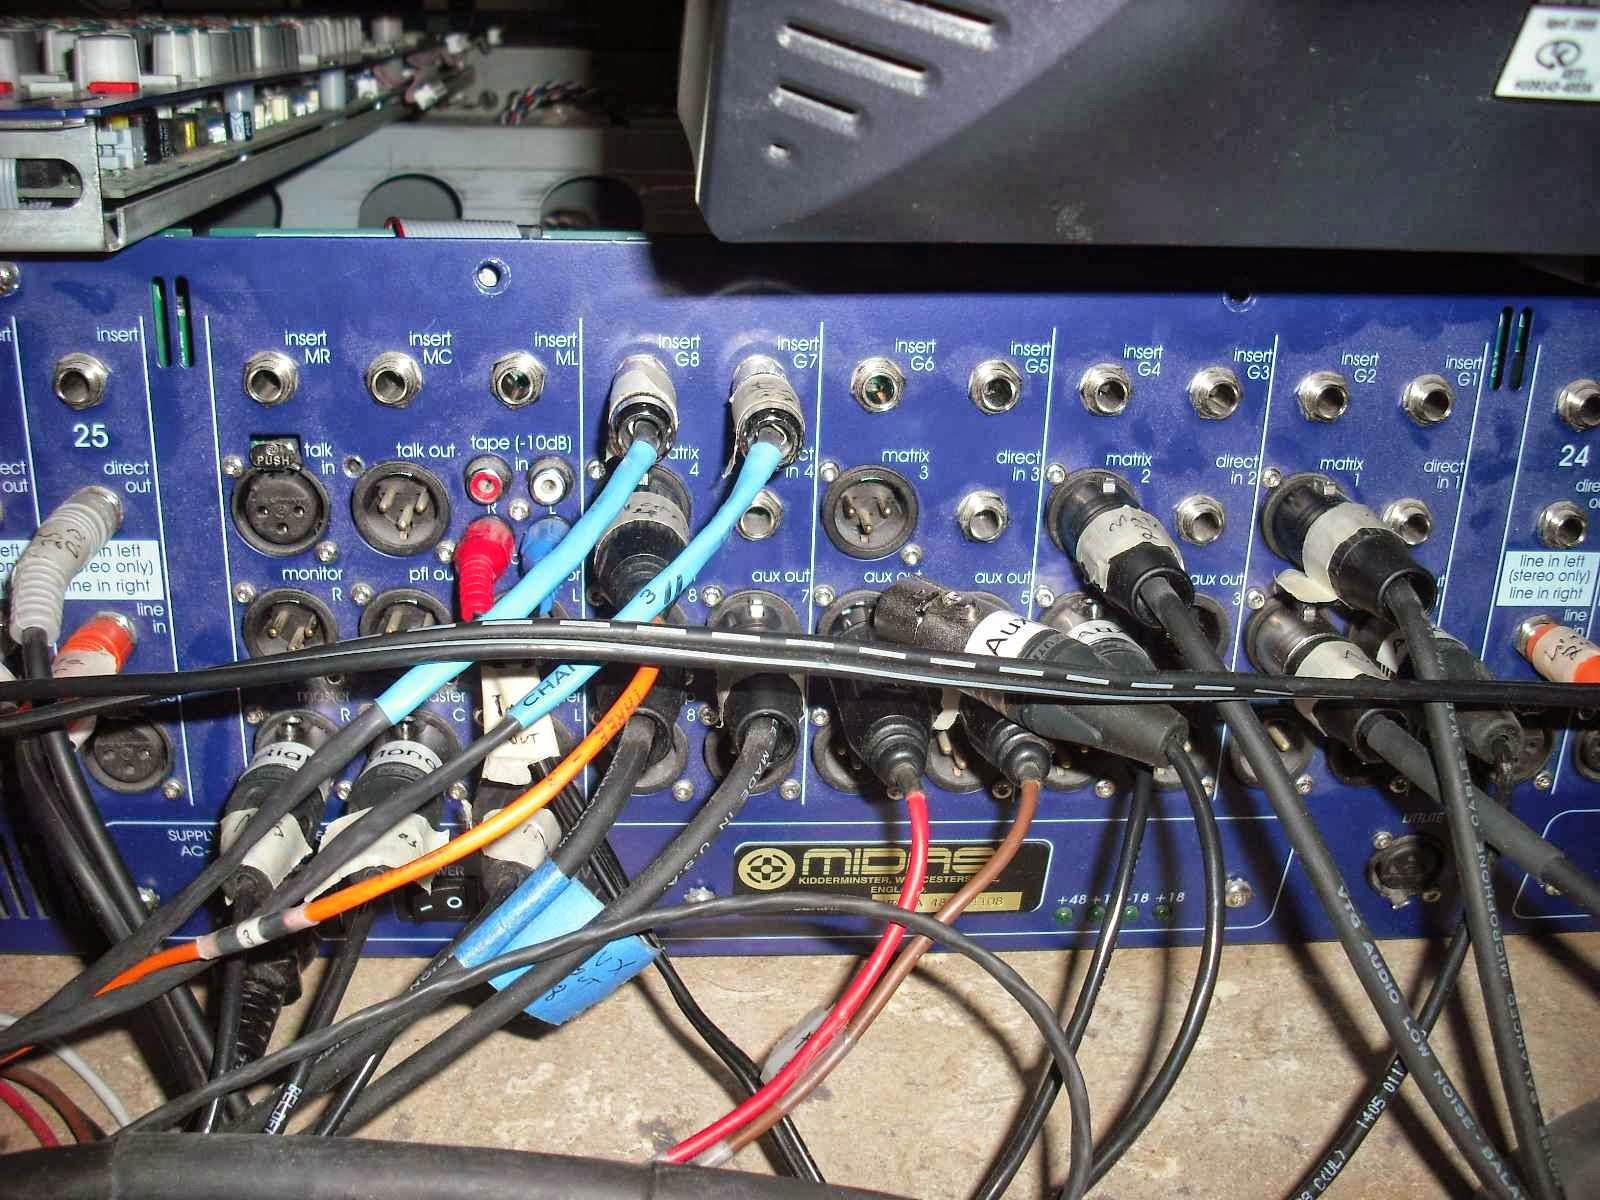 fixingelectronics midas verona soundboard. Black Bedroom Furniture Sets. Home Design Ideas